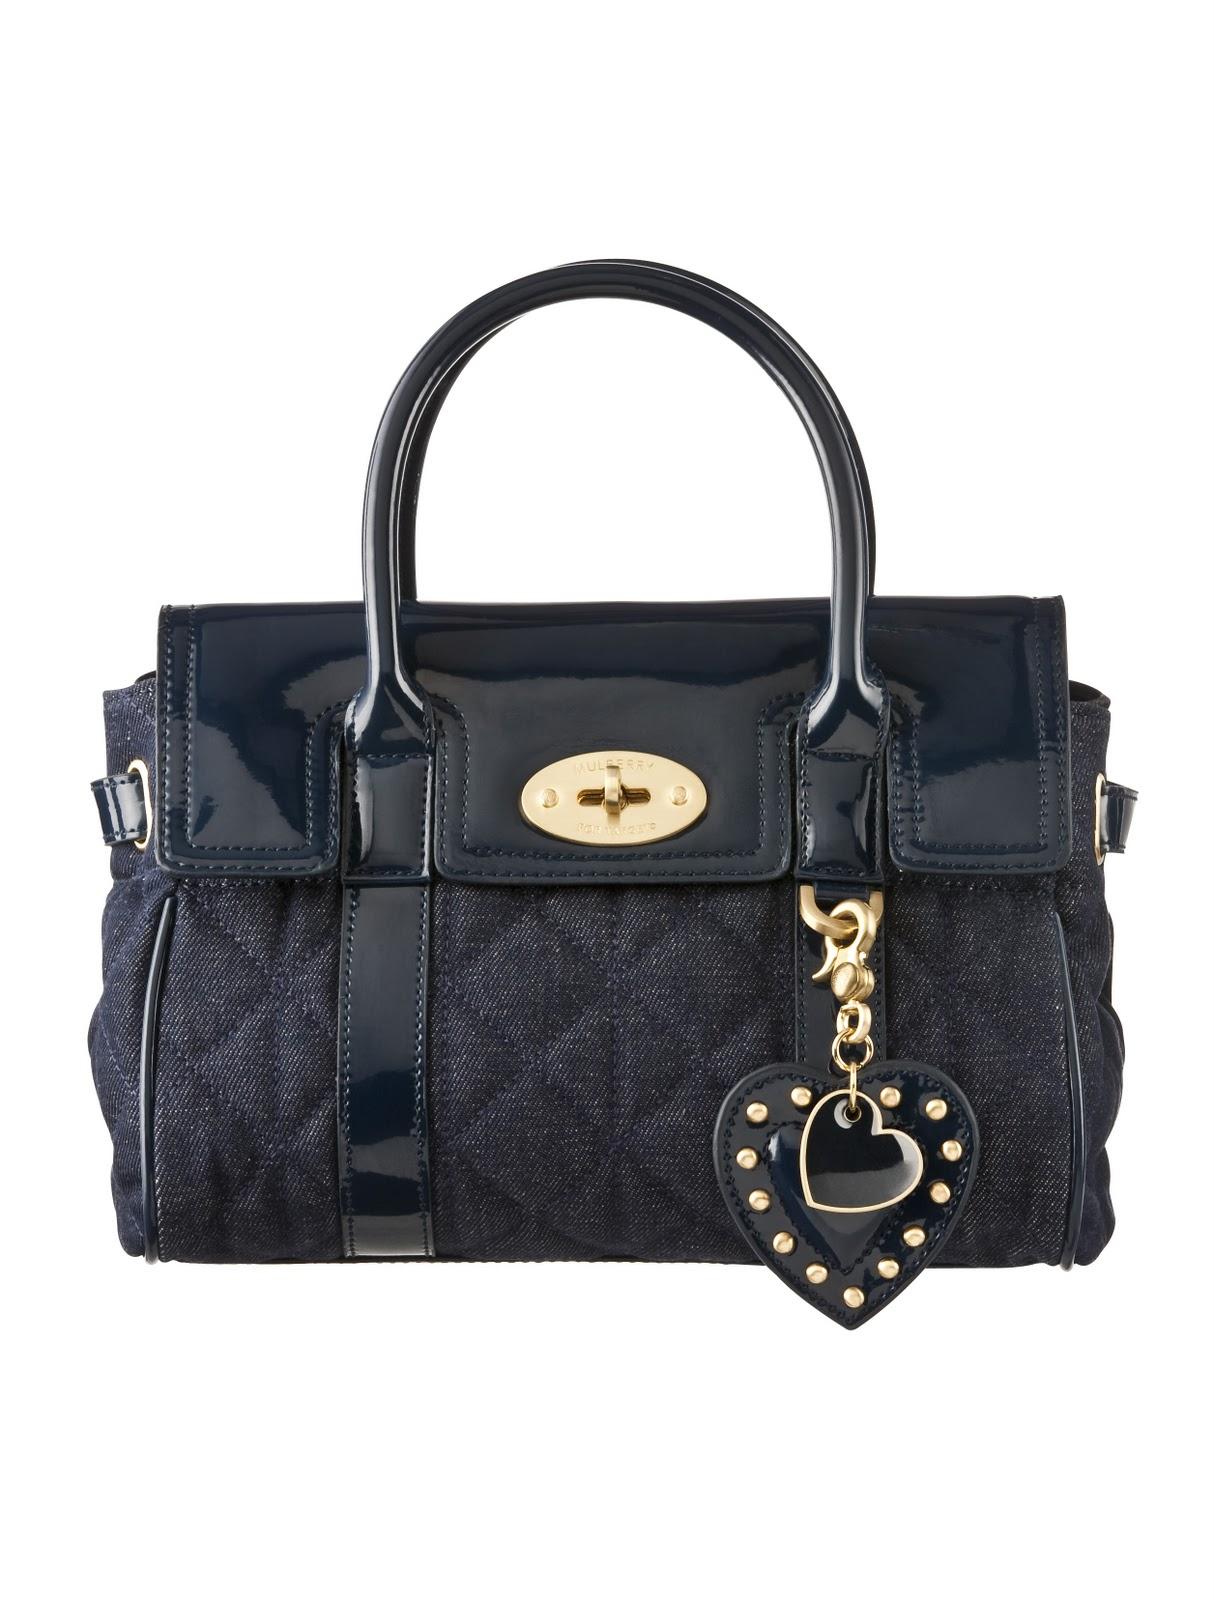 http://1.bp.blogspot.com/_tHQ1gA2brsc/TK-l1BwbWzI/AAAAAAAAGYA/48vnj85dCi0/s1600/Mulberry+for+Target+Look+05.jpg